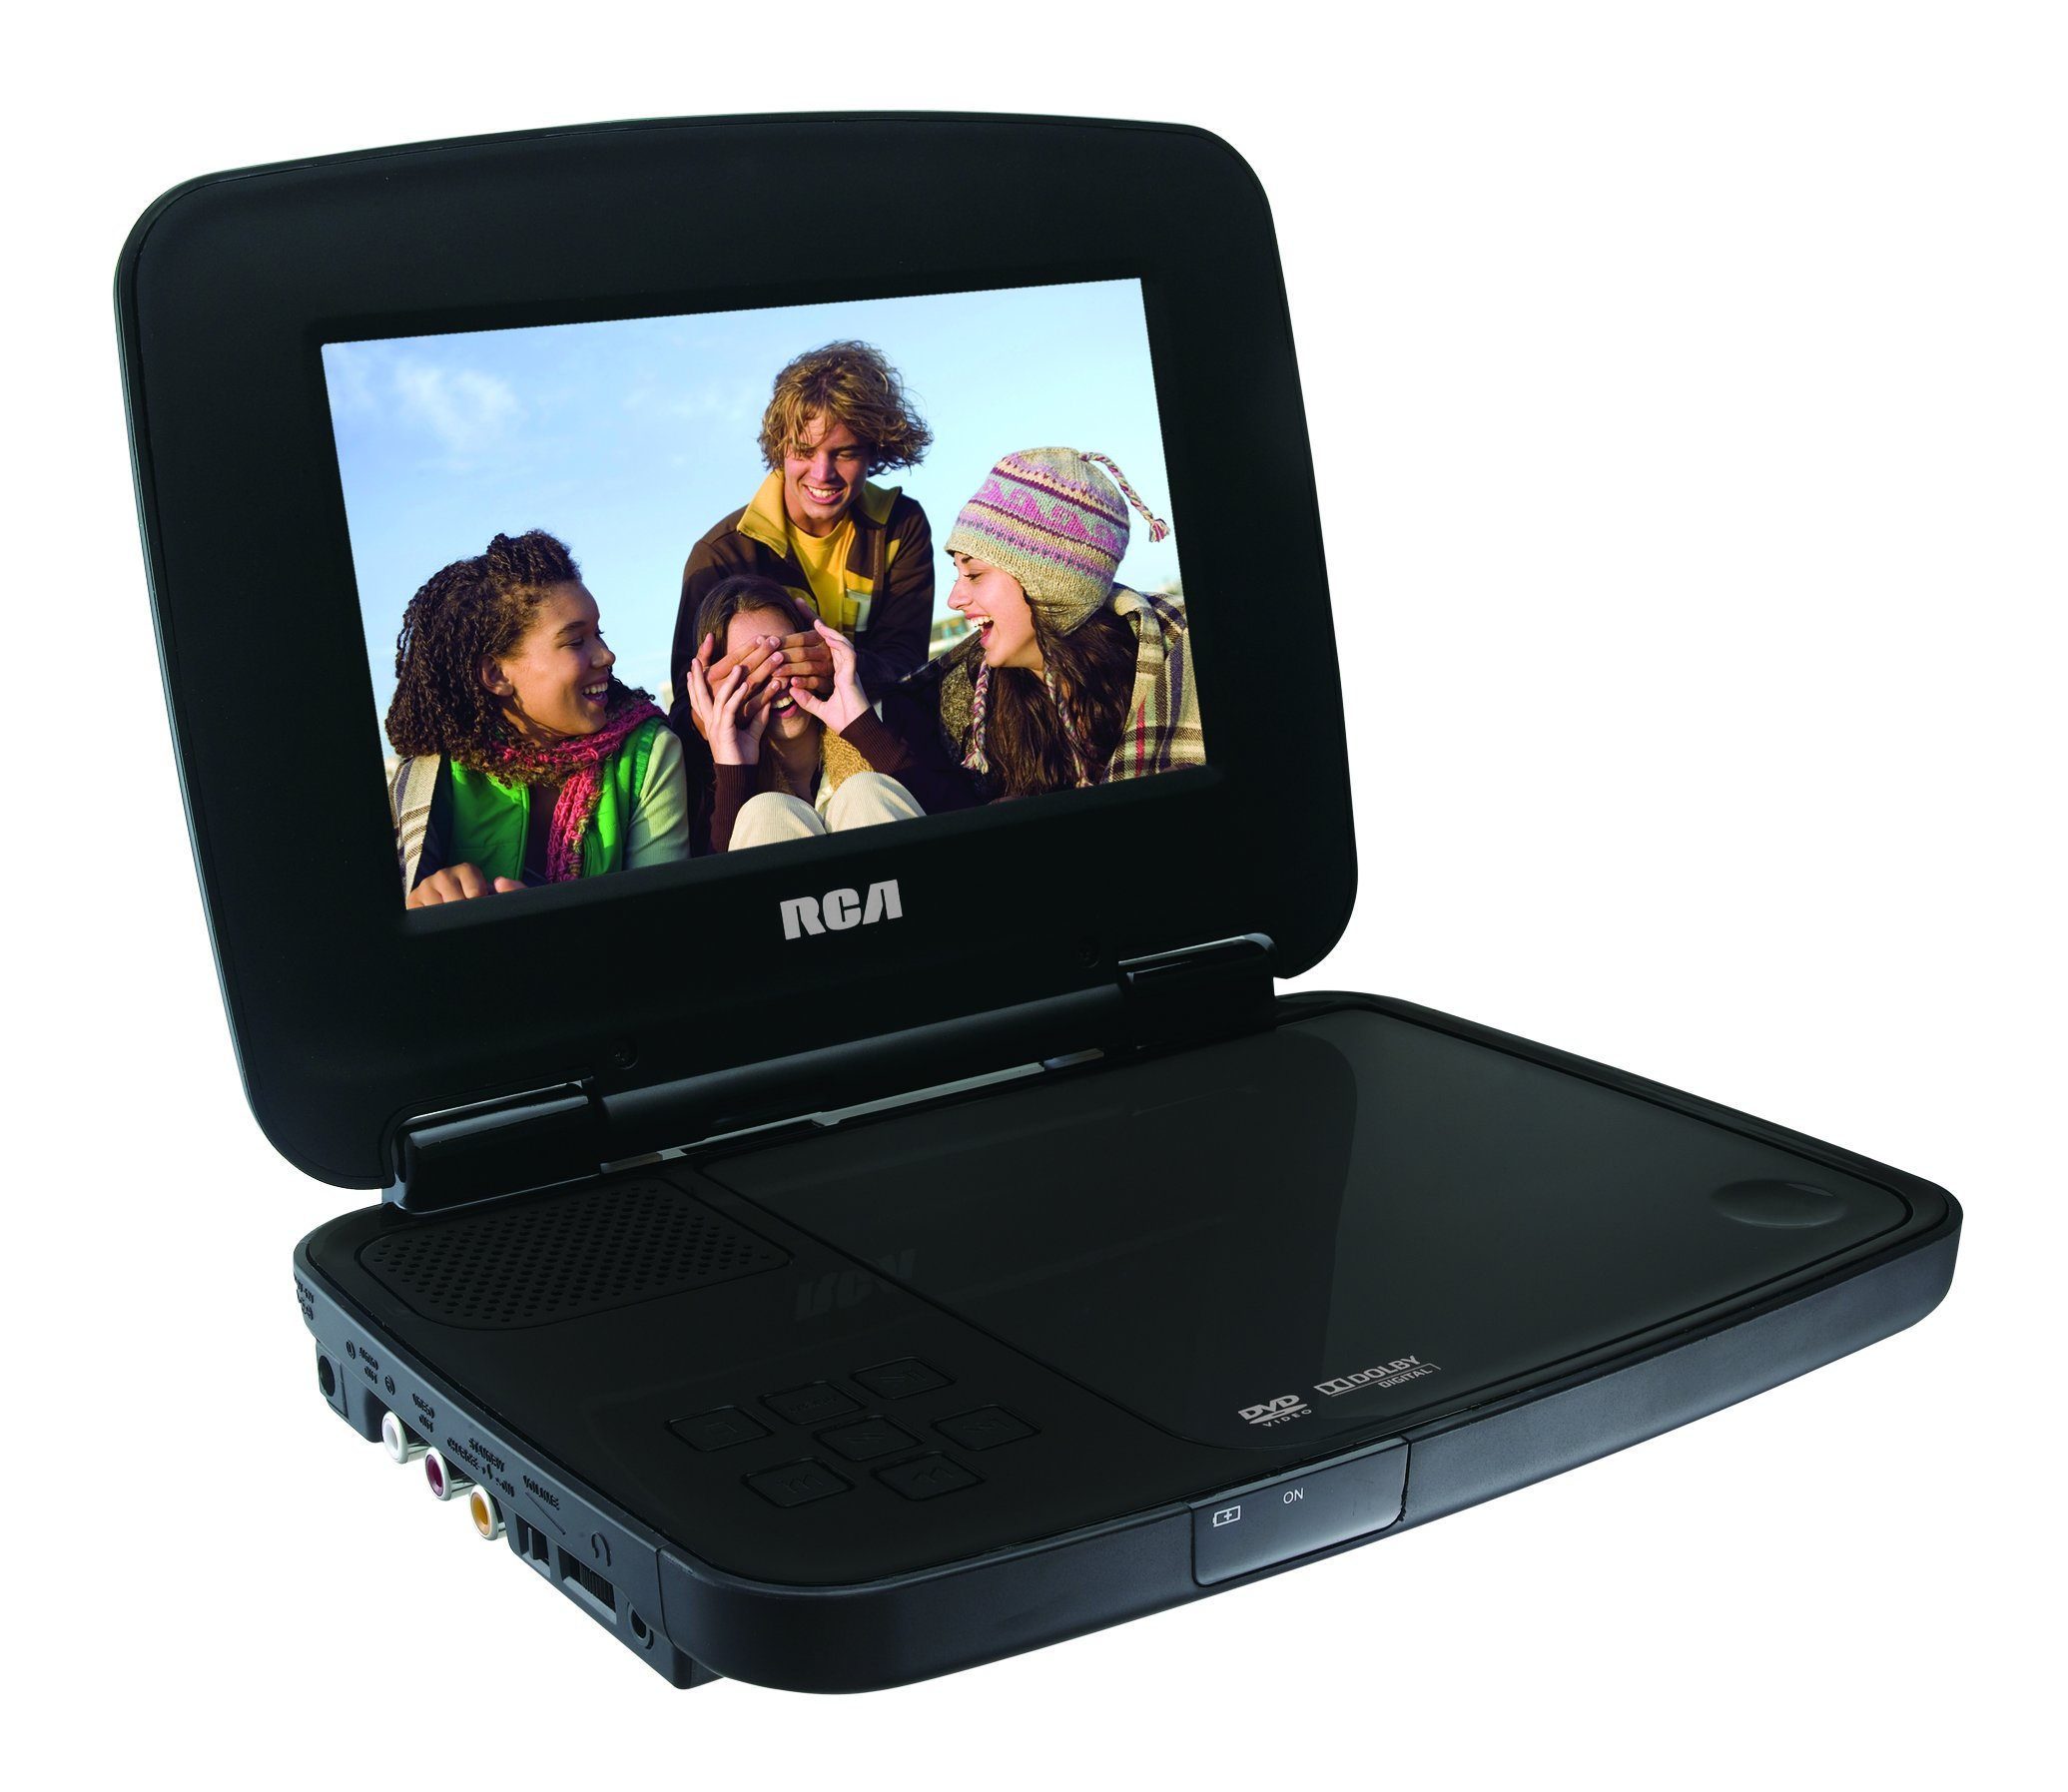 RCA DRC99371EB Portable DVD Player